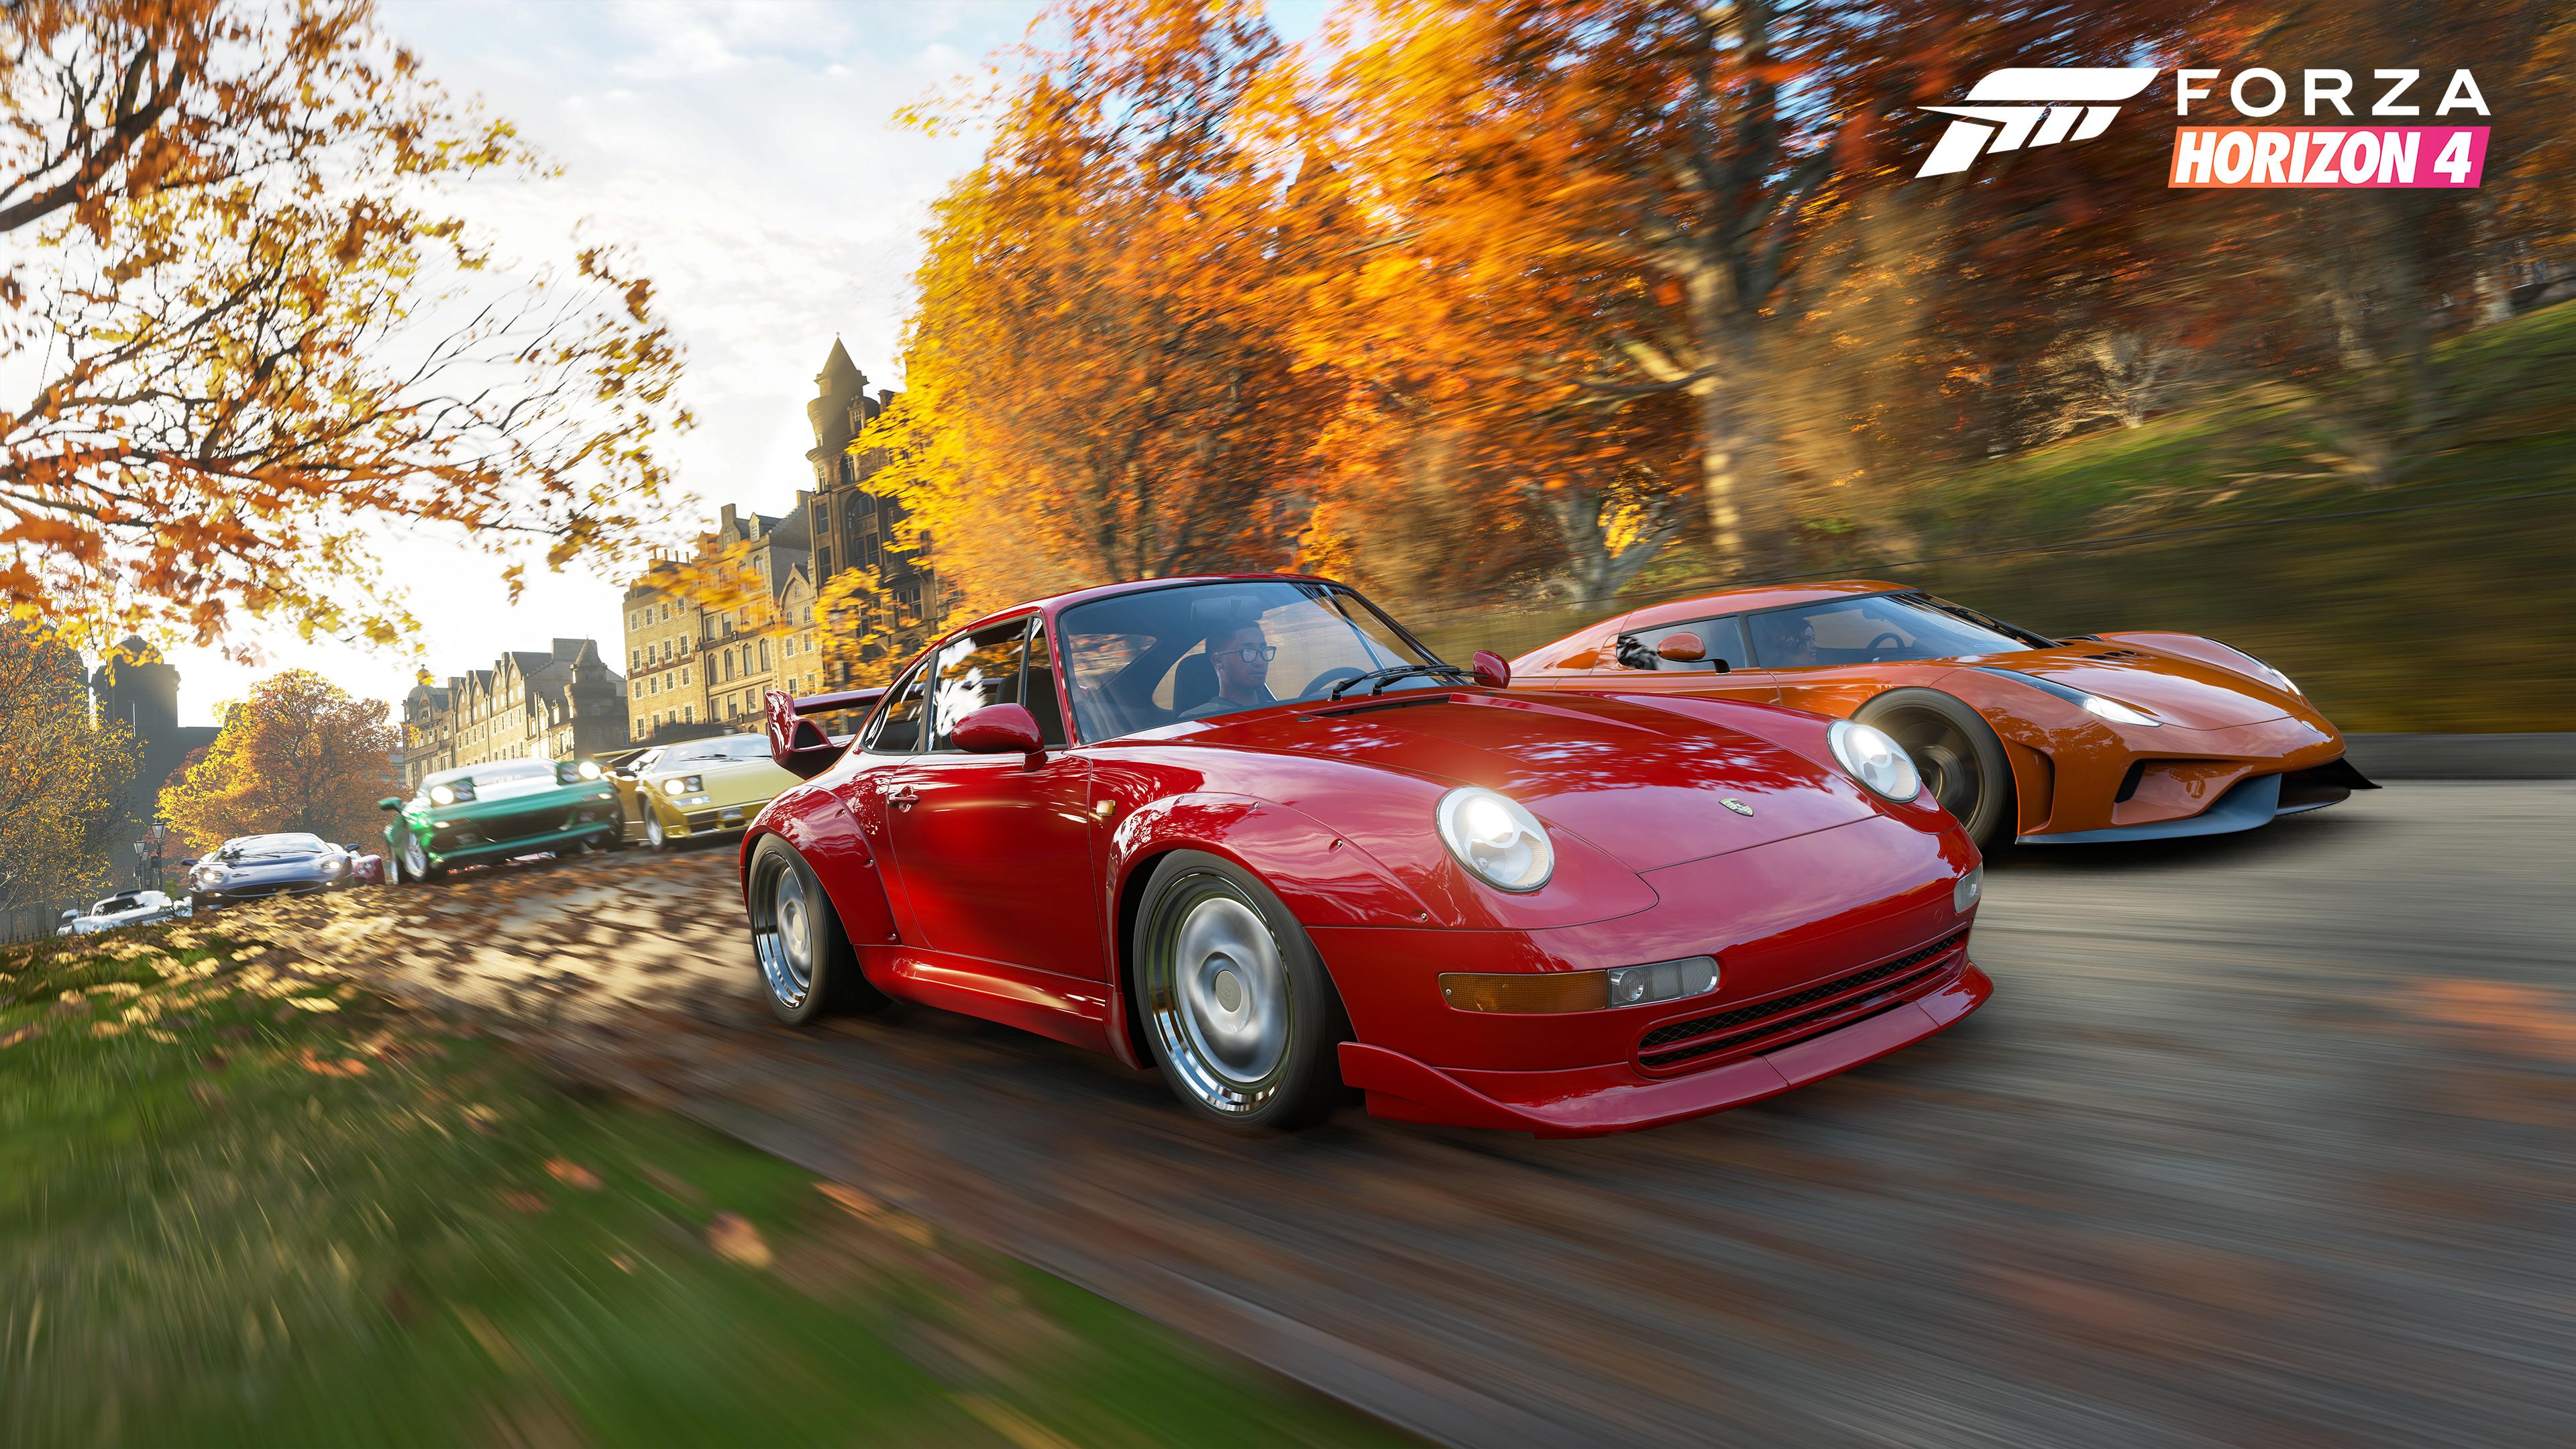 4k Wallpaper 3d 3840x2400 Forza Horizon 4 4k Hd Games 4k Wallpapers Images